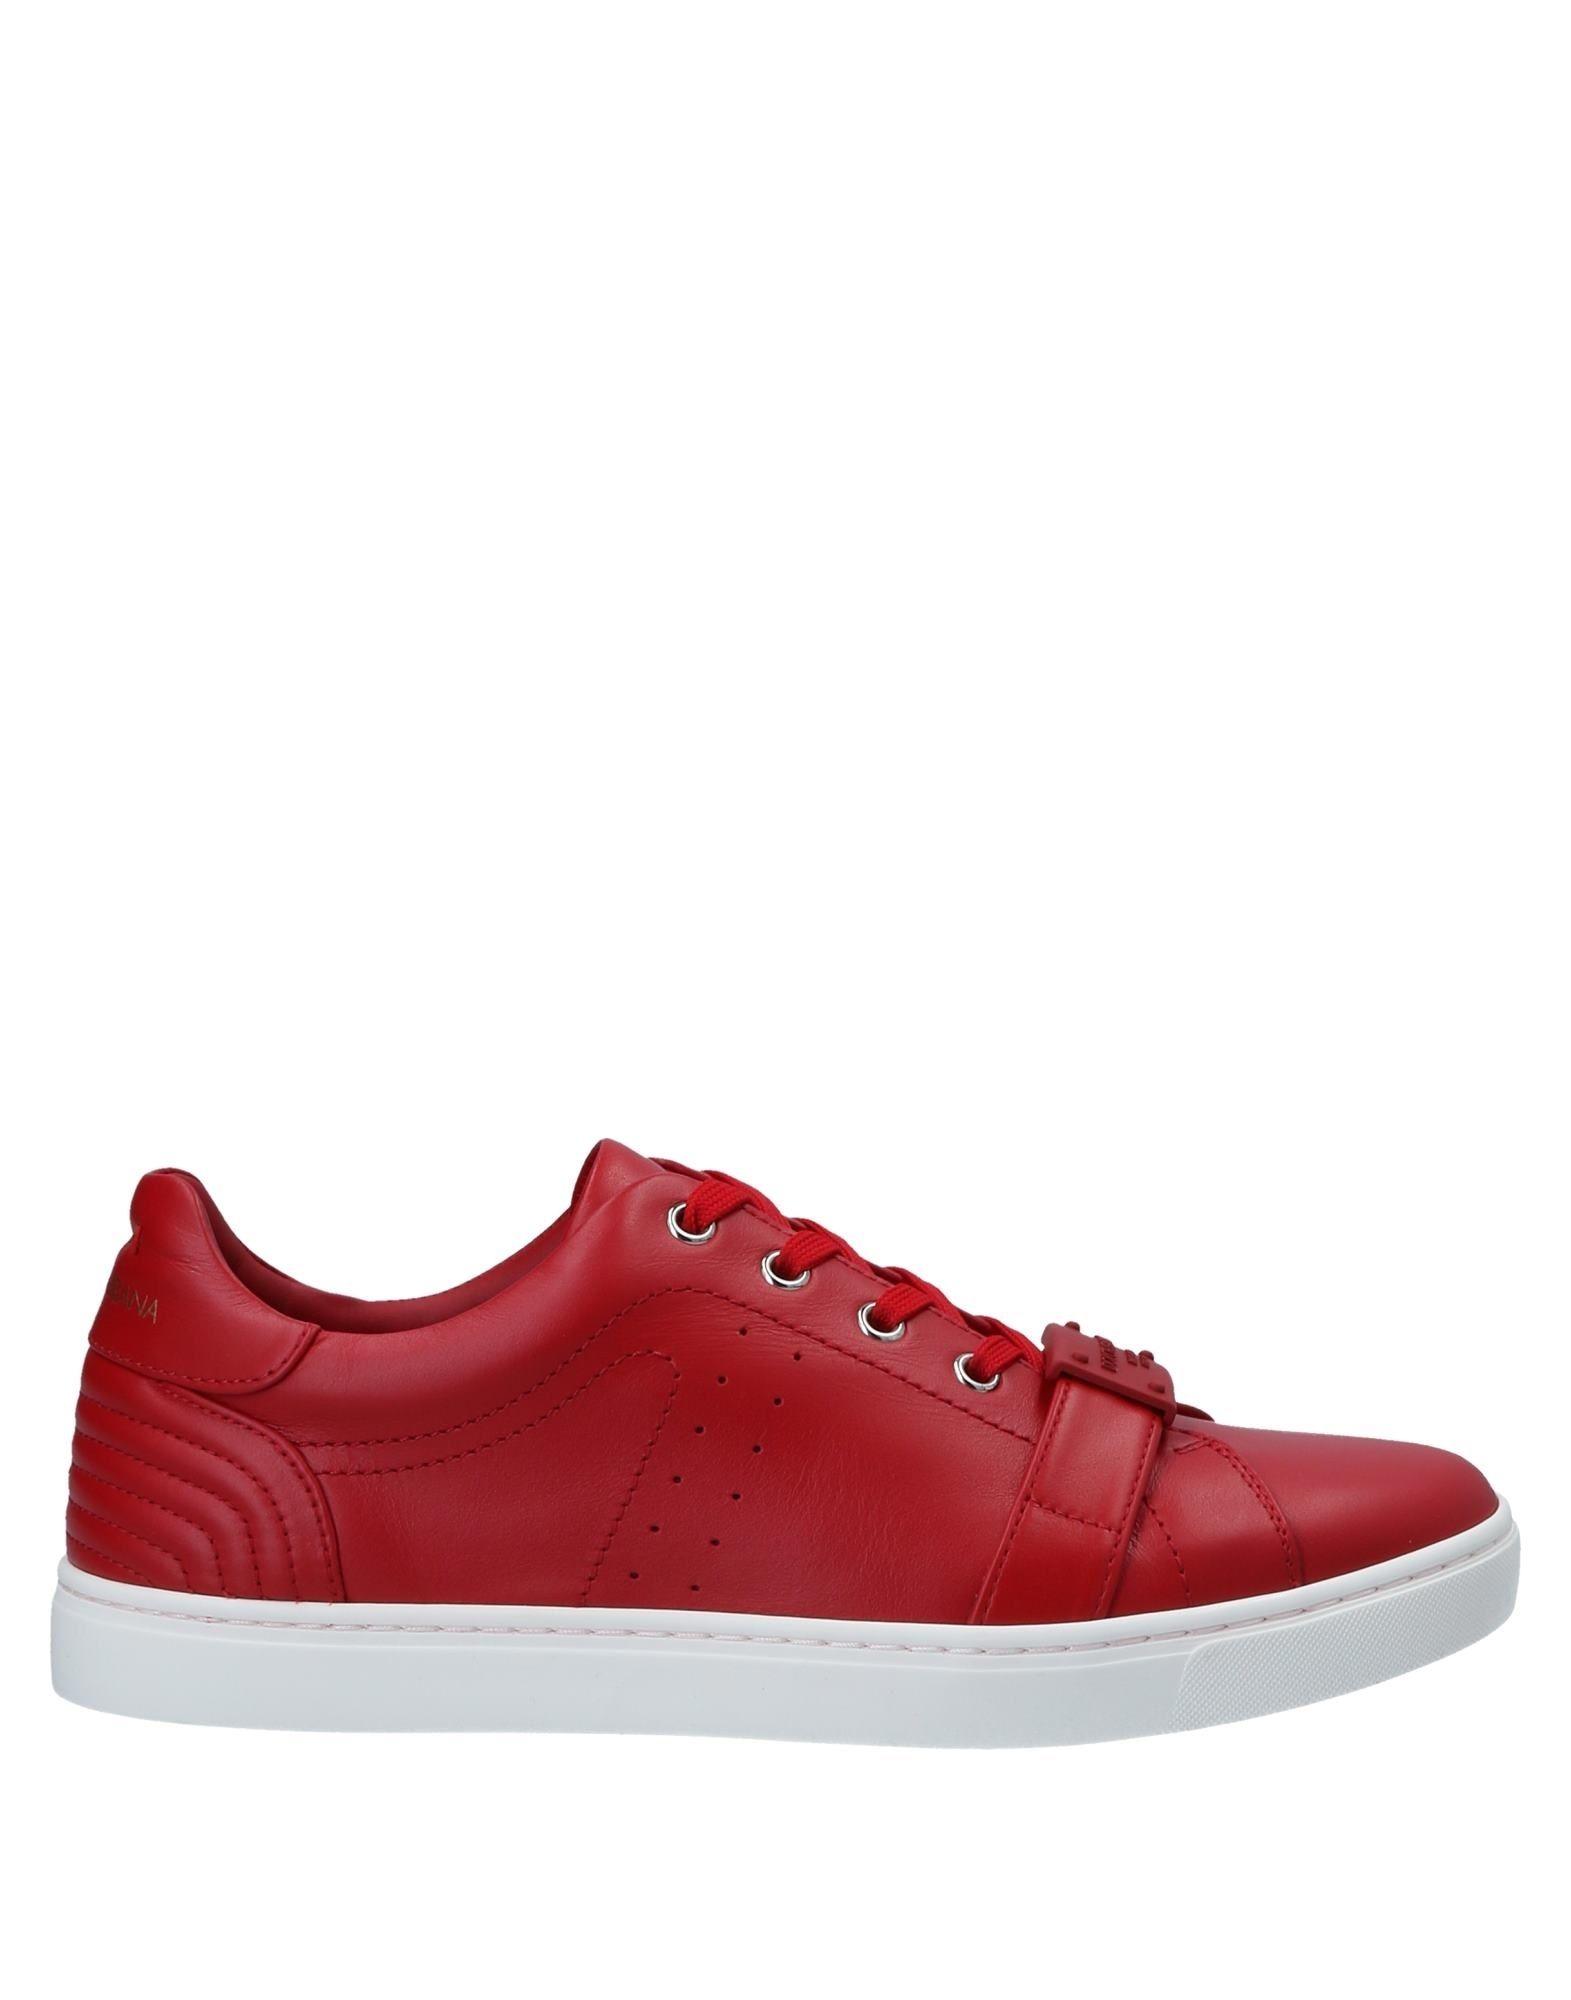 Dolce & Gabbana Sneakers Herren  11489110EP Gute Qualität beliebte Schuhe